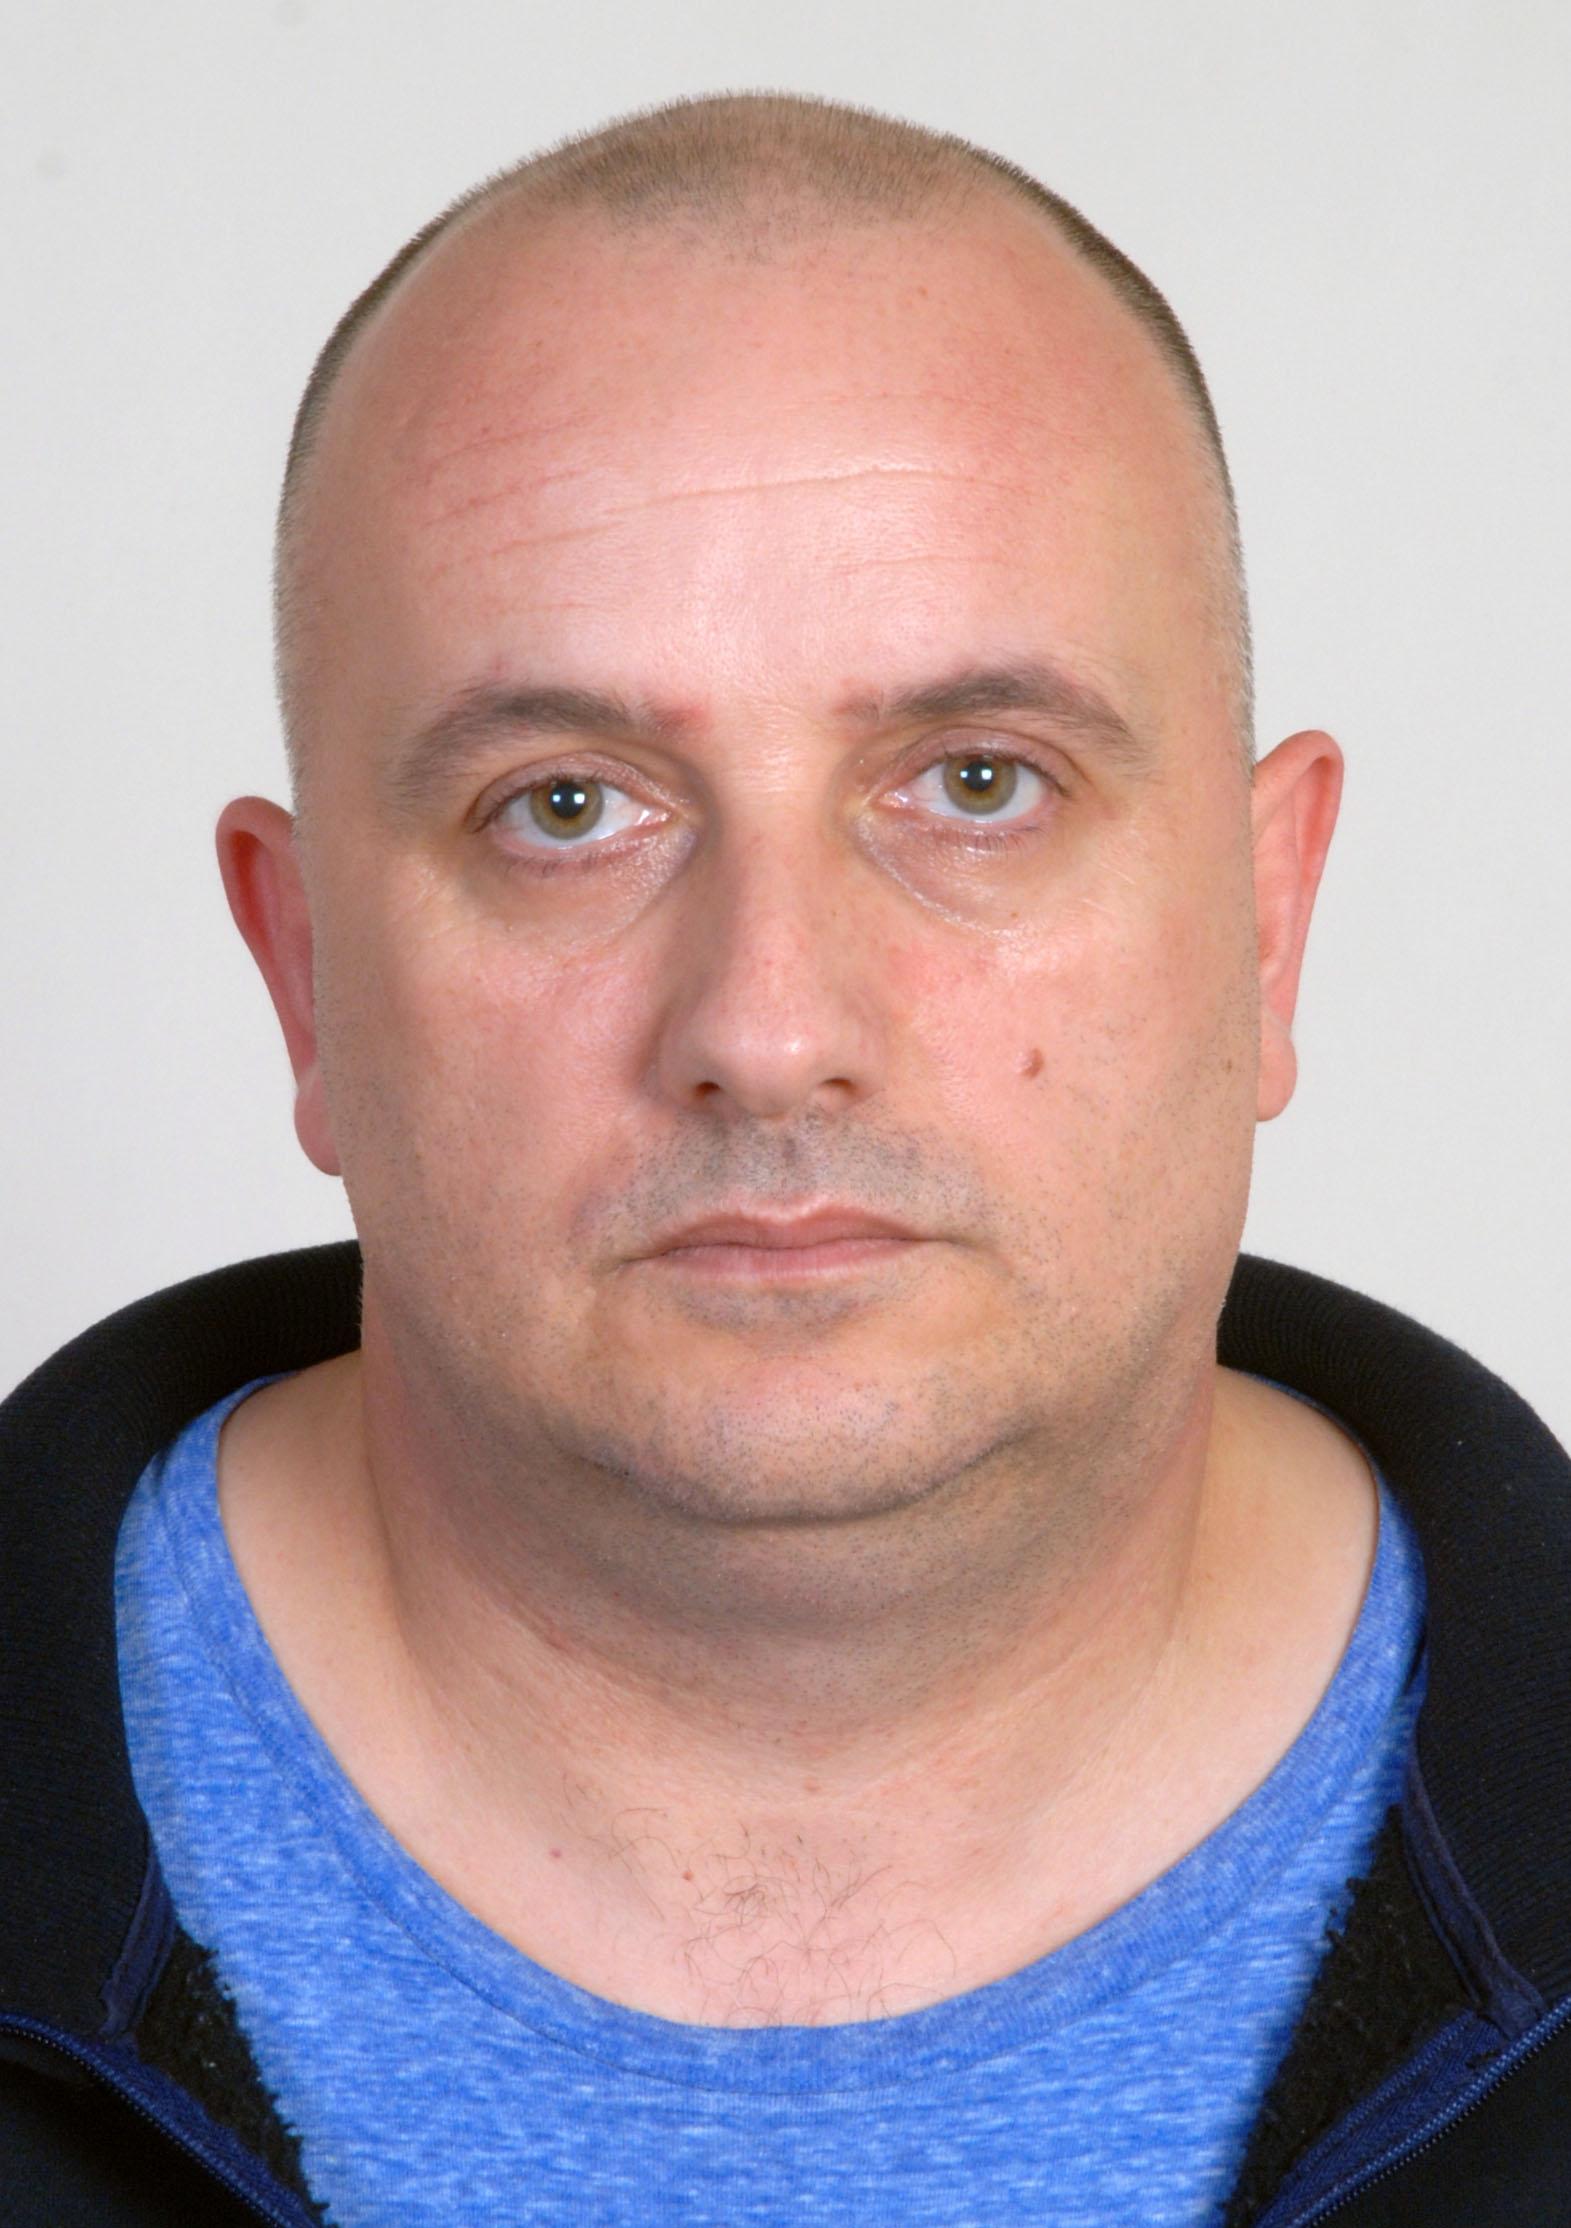 Uhapšen prevarant iz Banja Luke